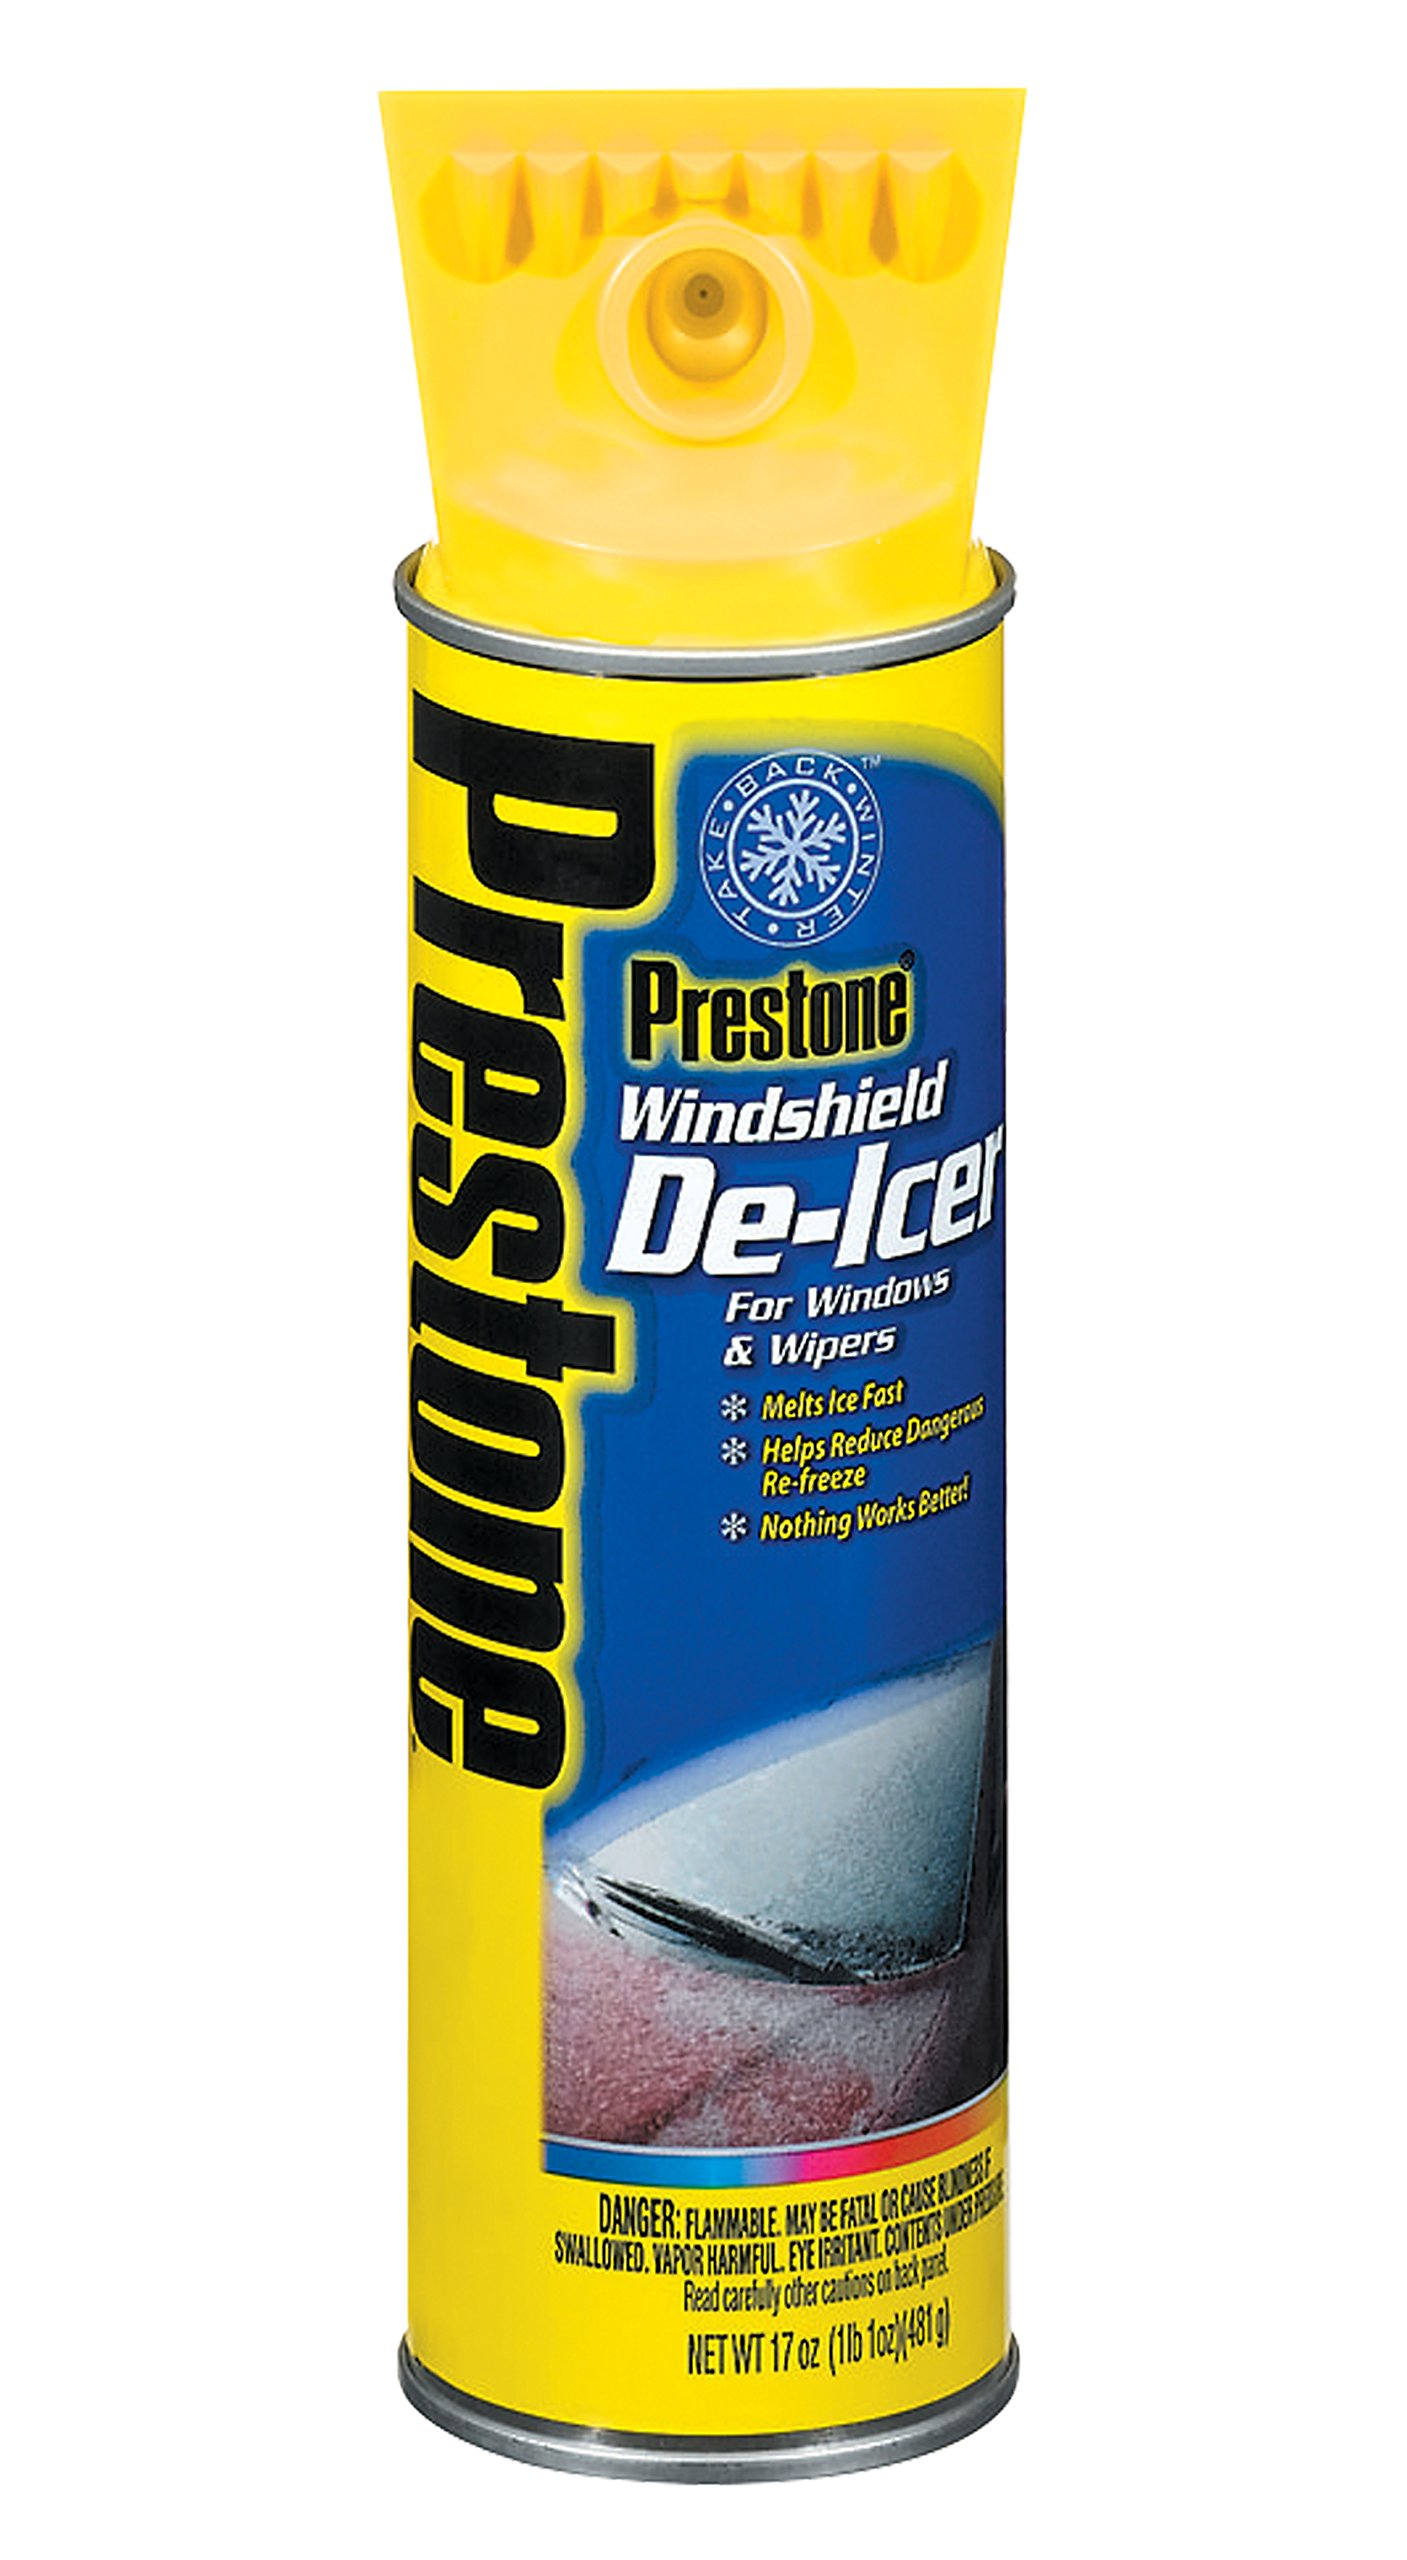 Prestone AS244-6PK Windshield De-Icer - 17 oz. Aerosol, (Pack of 6) by Prestone